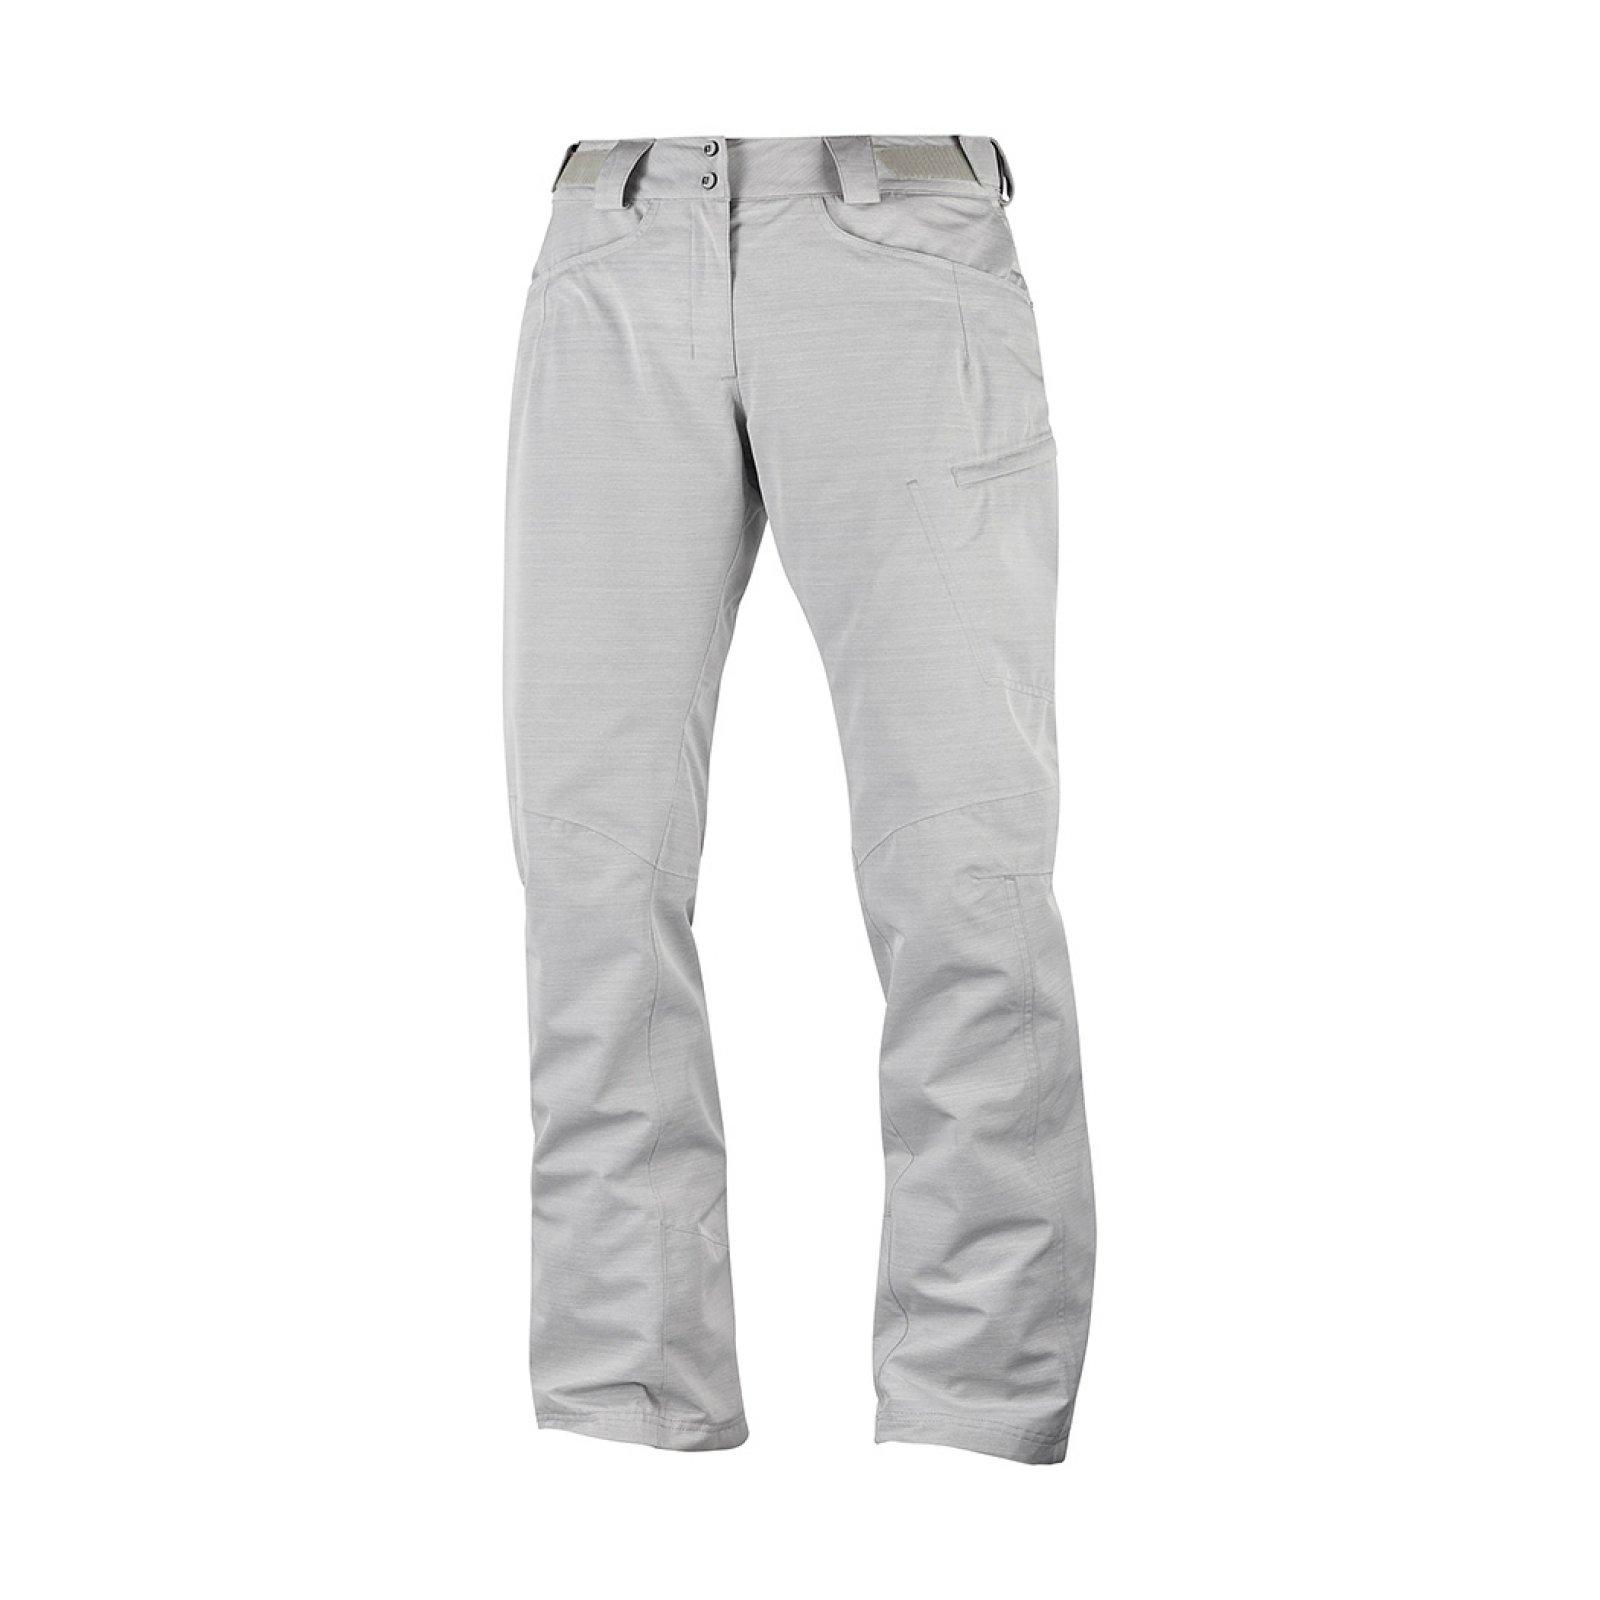 Lyžařské kalhoty Salomon Fantasy Pant W vapor heather L40367100 ... 2f19cff9f9